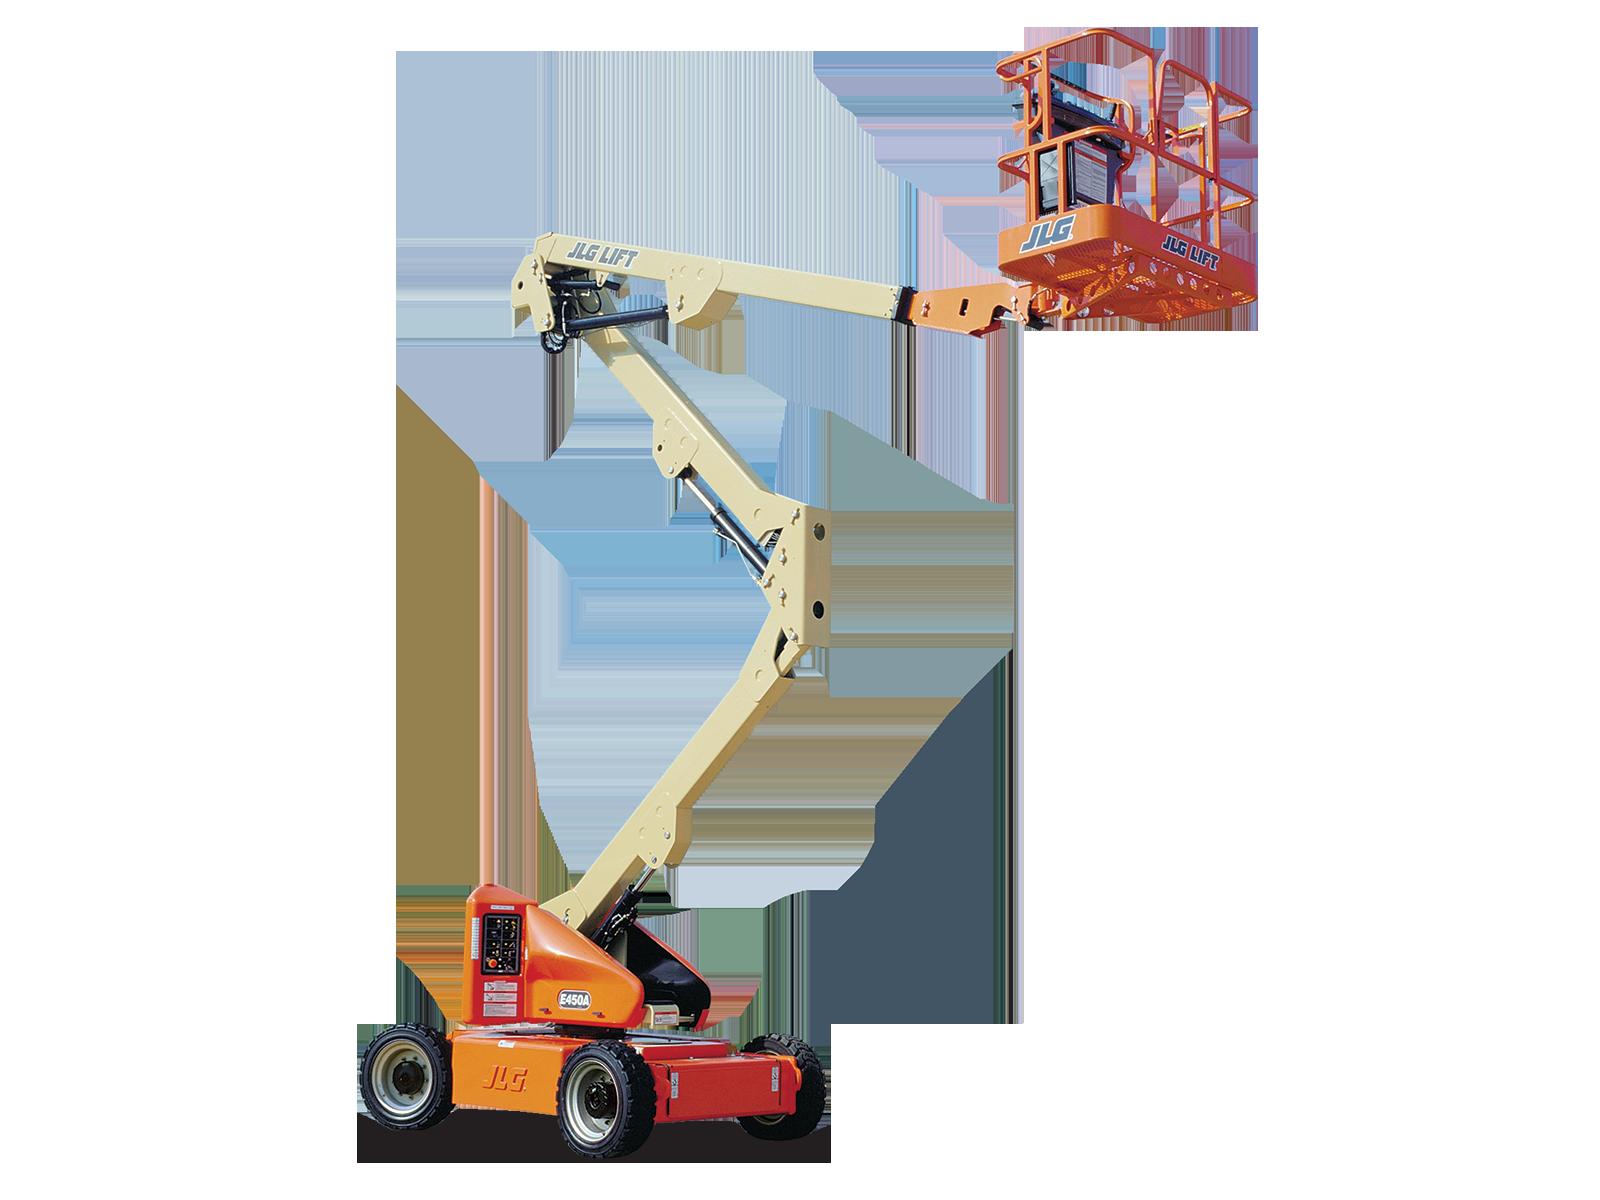 e450a electric boom lift jlg rh jlg com JLG Wiring Diagram Model 40 1993 GMC Wiring Schematic for Lights